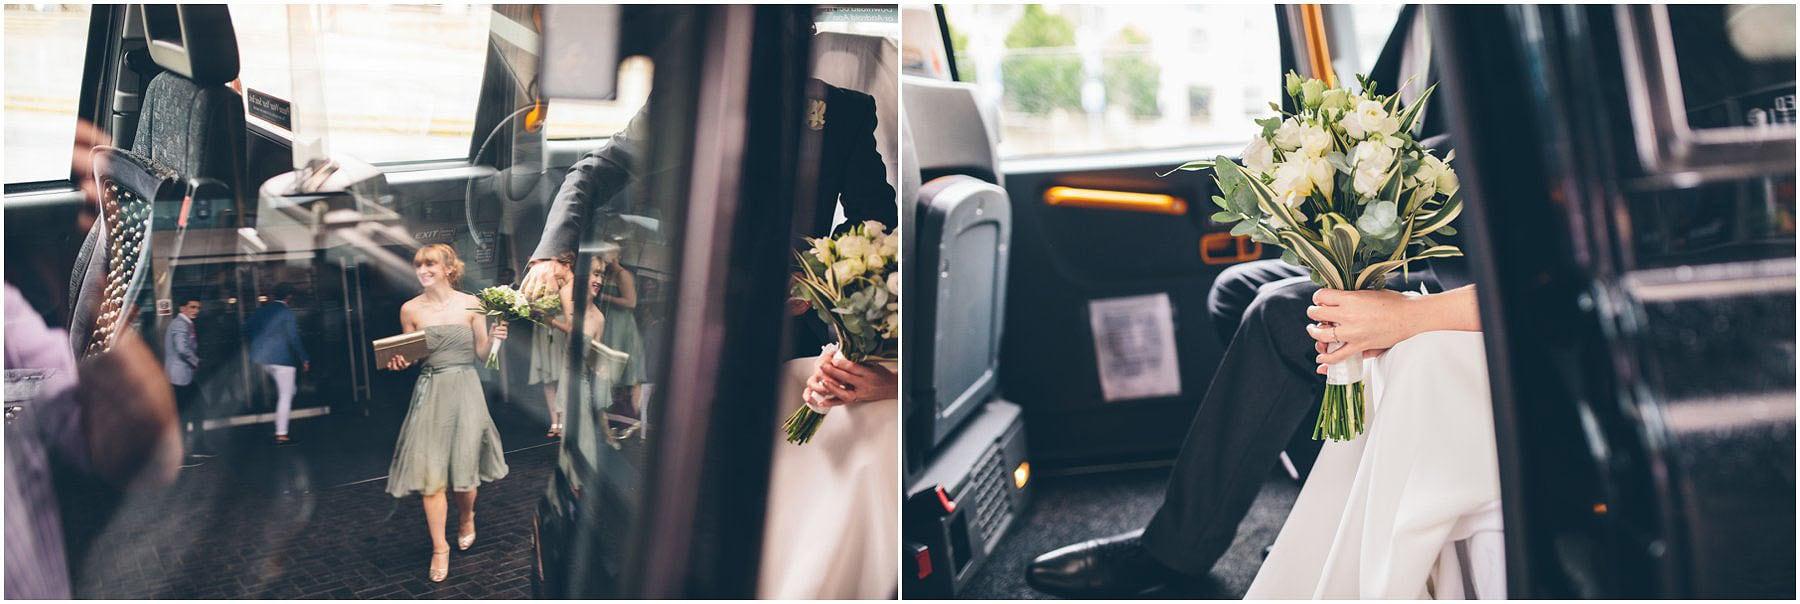 Lowry_Theatre_Wedding_Photography_0023